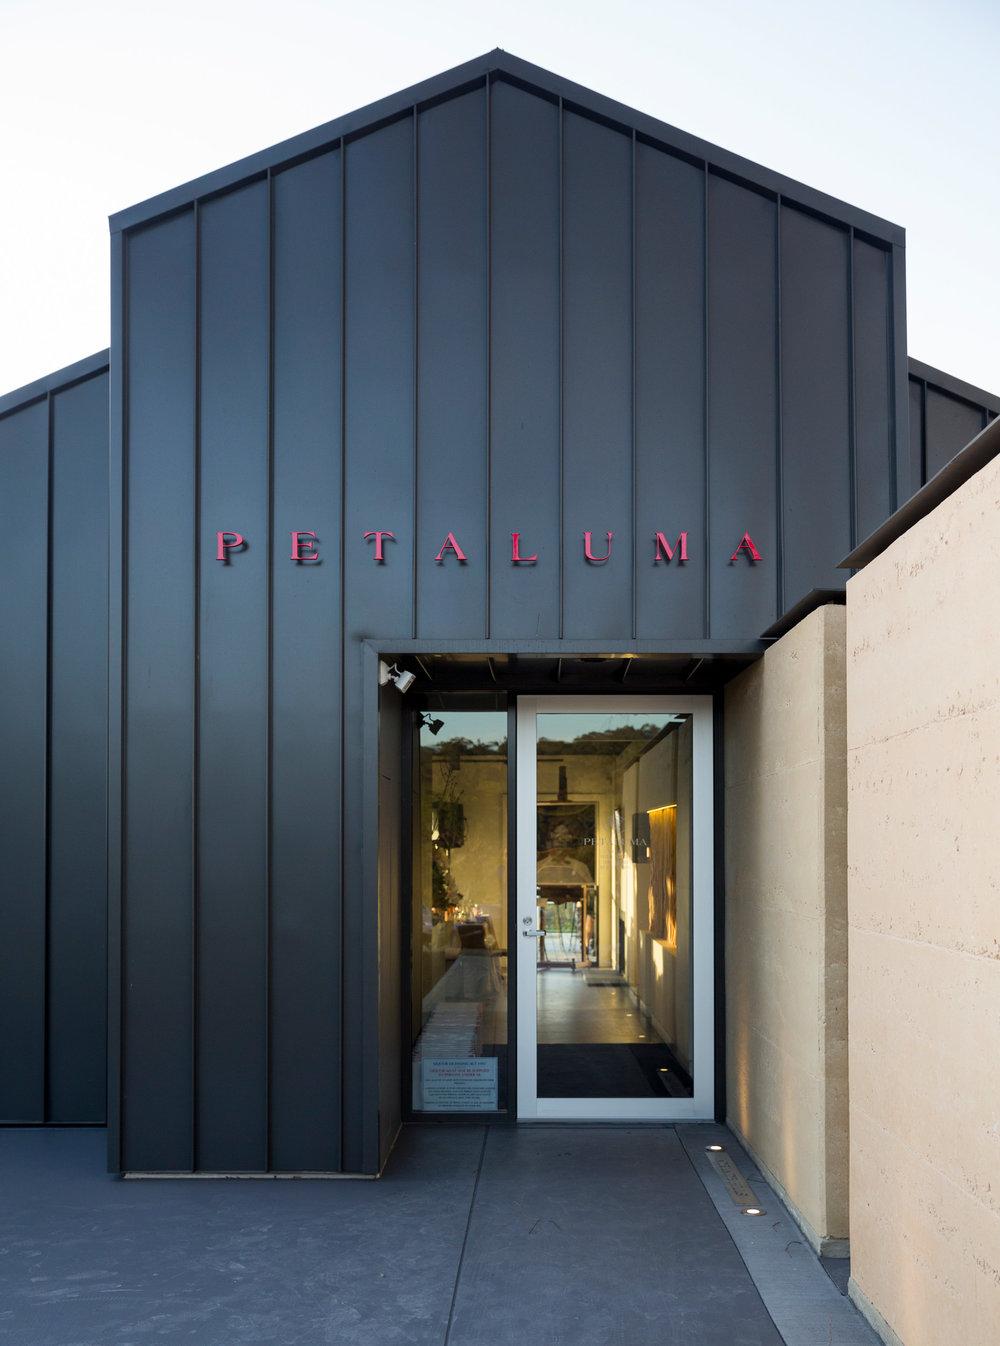 Jem_Cresswell_Architecture_Commercial_Photographer_Sydney_Australia_018.jpg